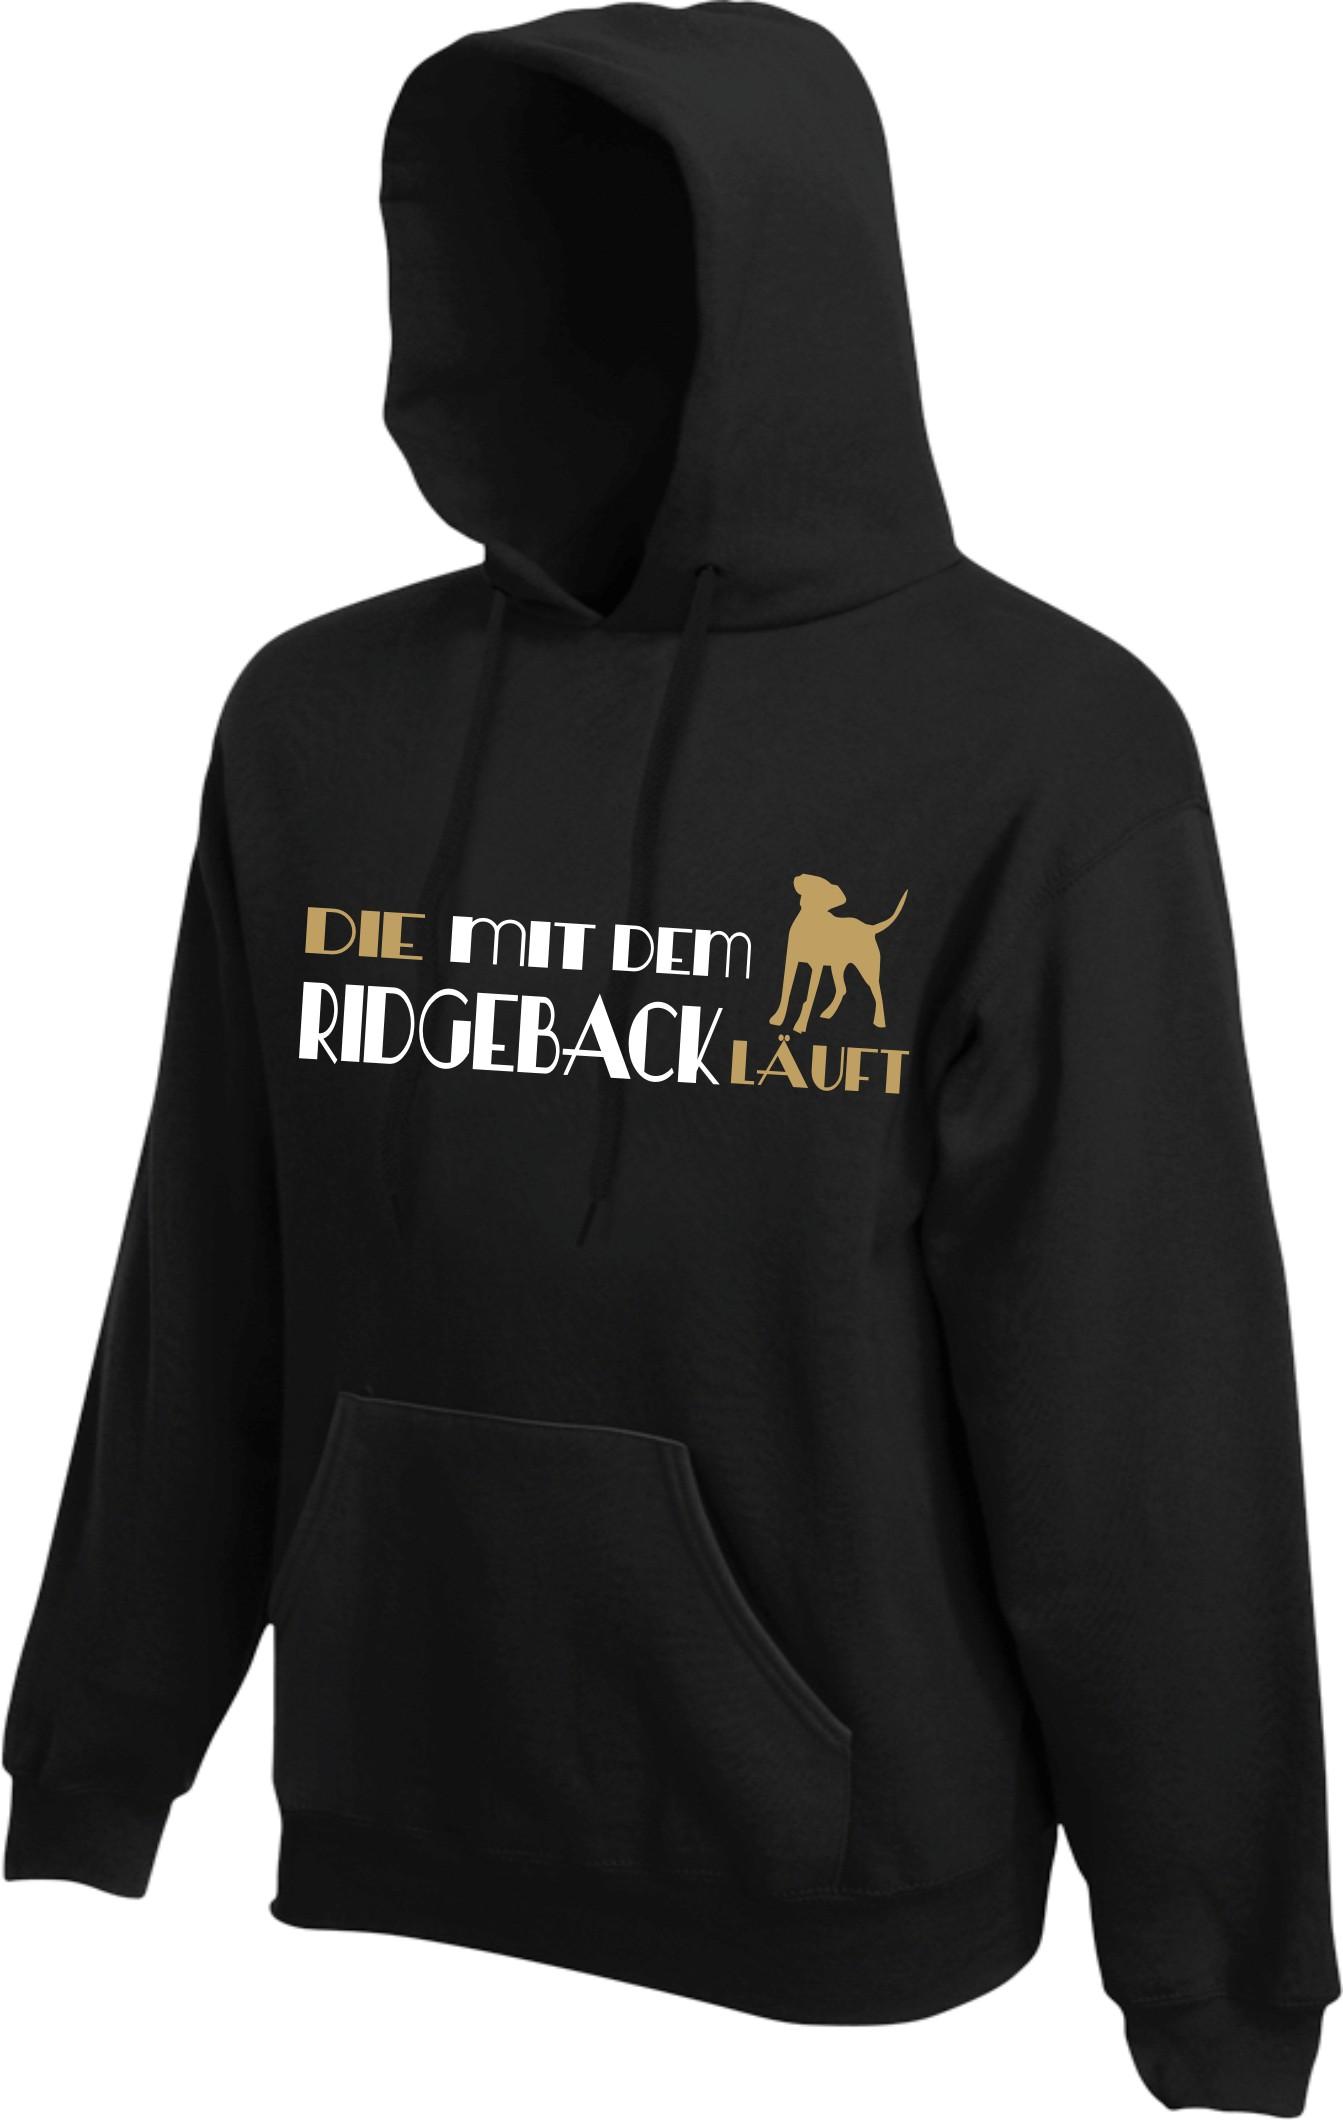 Ridgeback Pulli Hoodie Hund Hunde Geschenk Kapuze Sweater ...